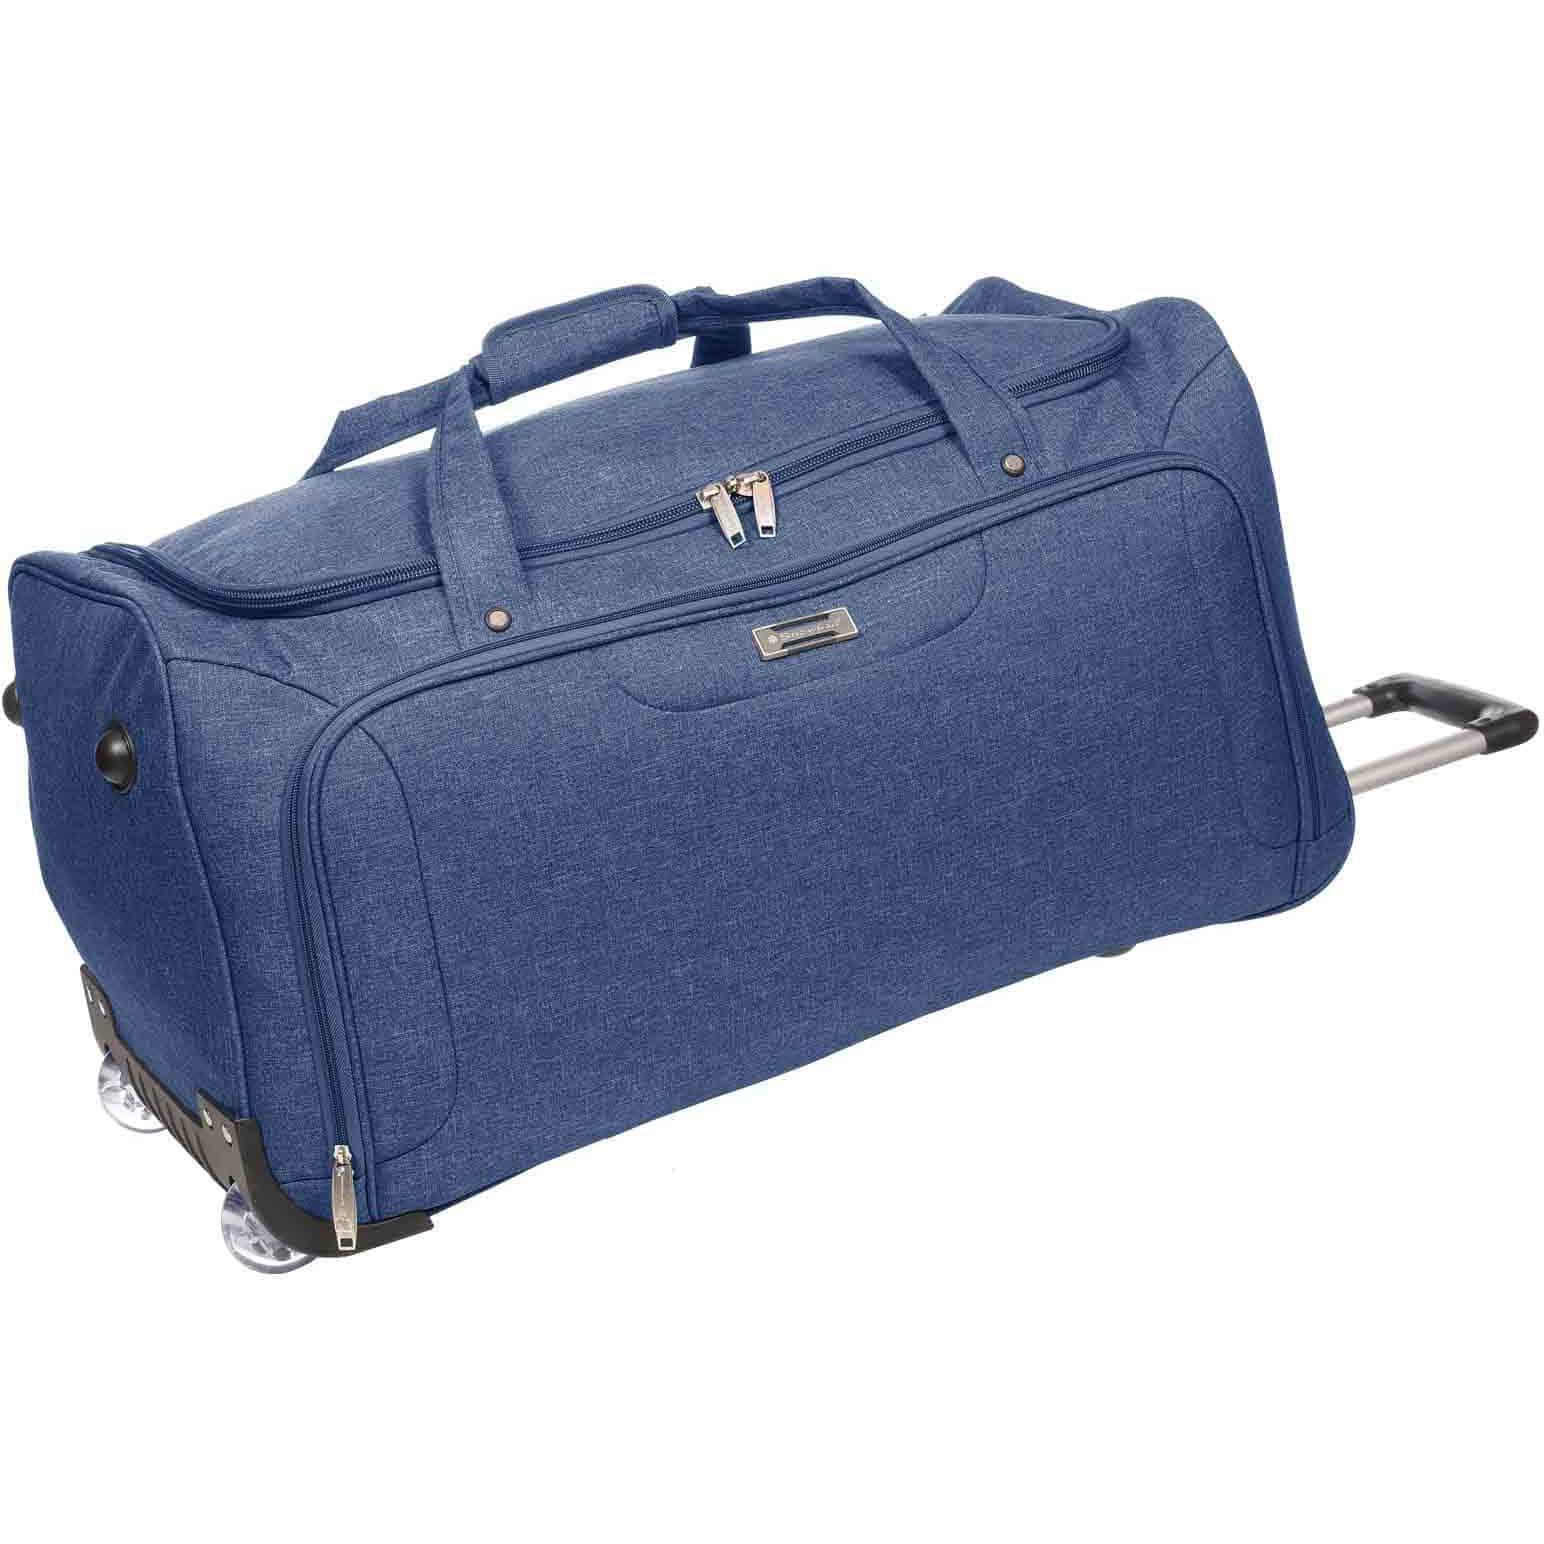 Lonsdale Sac /à bandouli/ère mod/èle classic Bleu marine